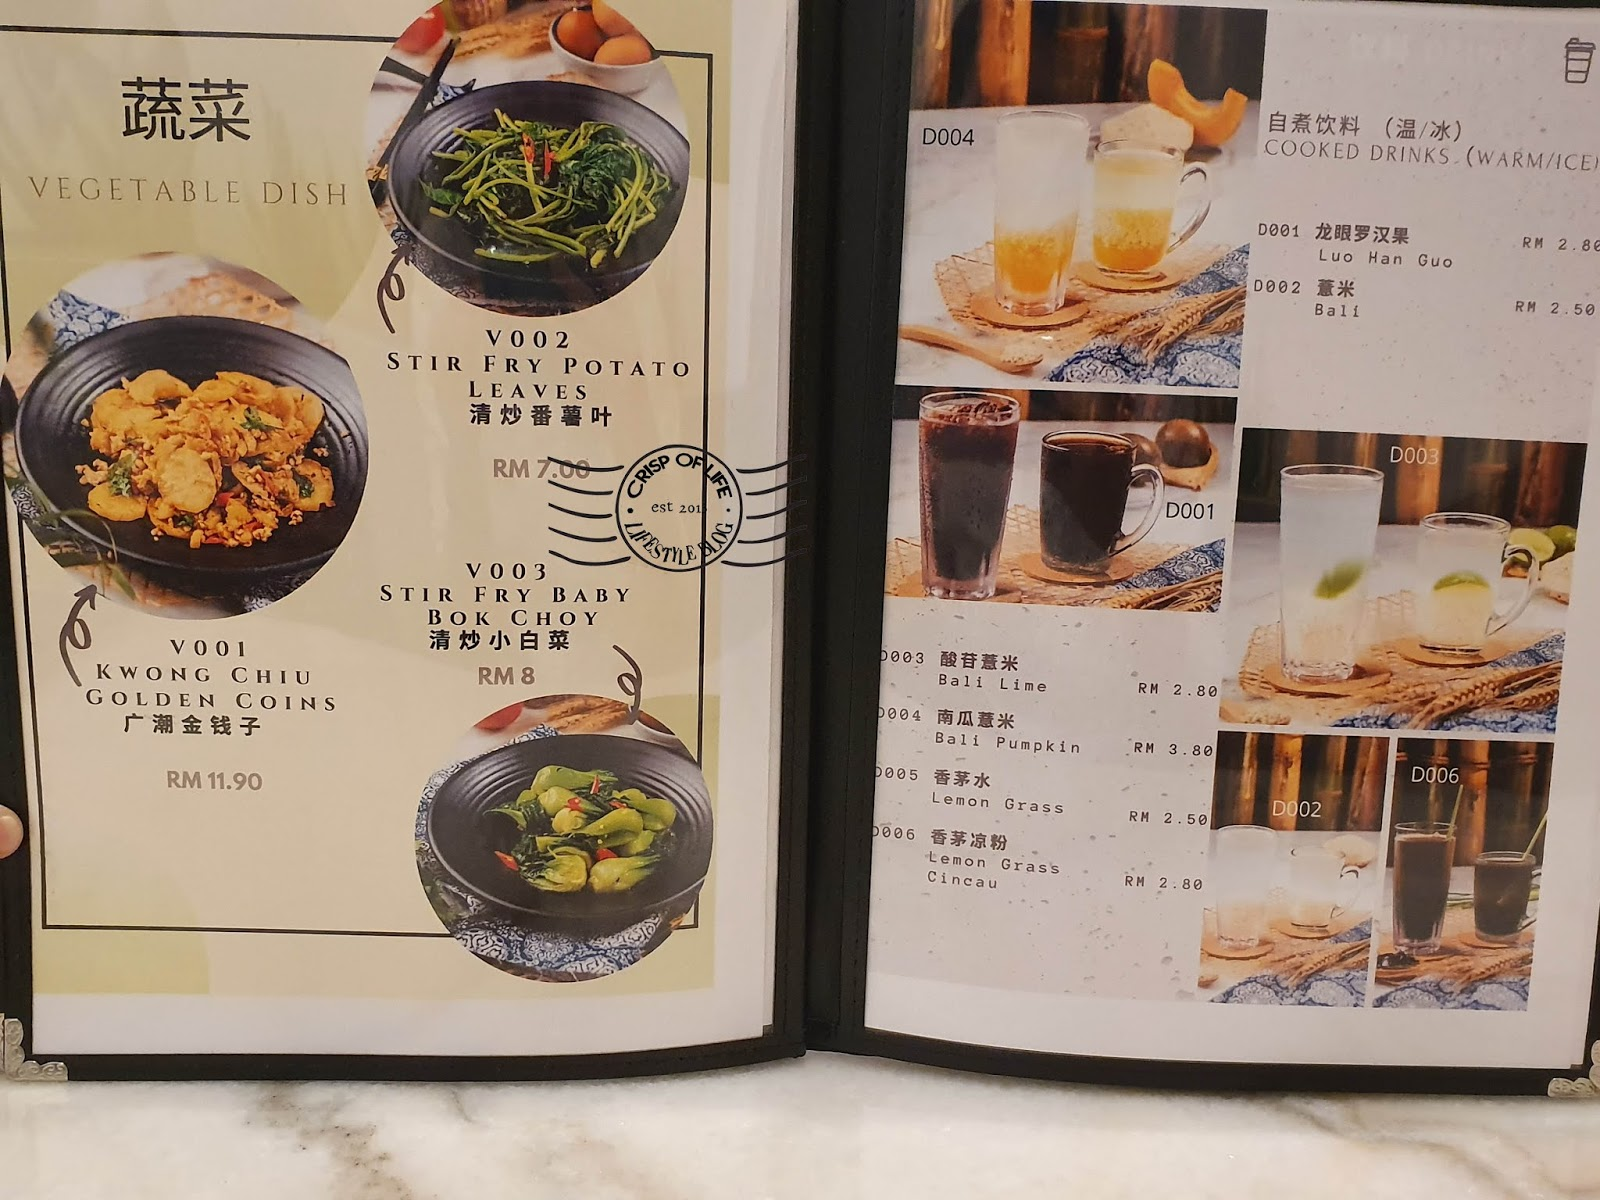 KL Style Hokkien Mee @ Kwong Chiu Restaurant 广潮, Jalan Siam Penang